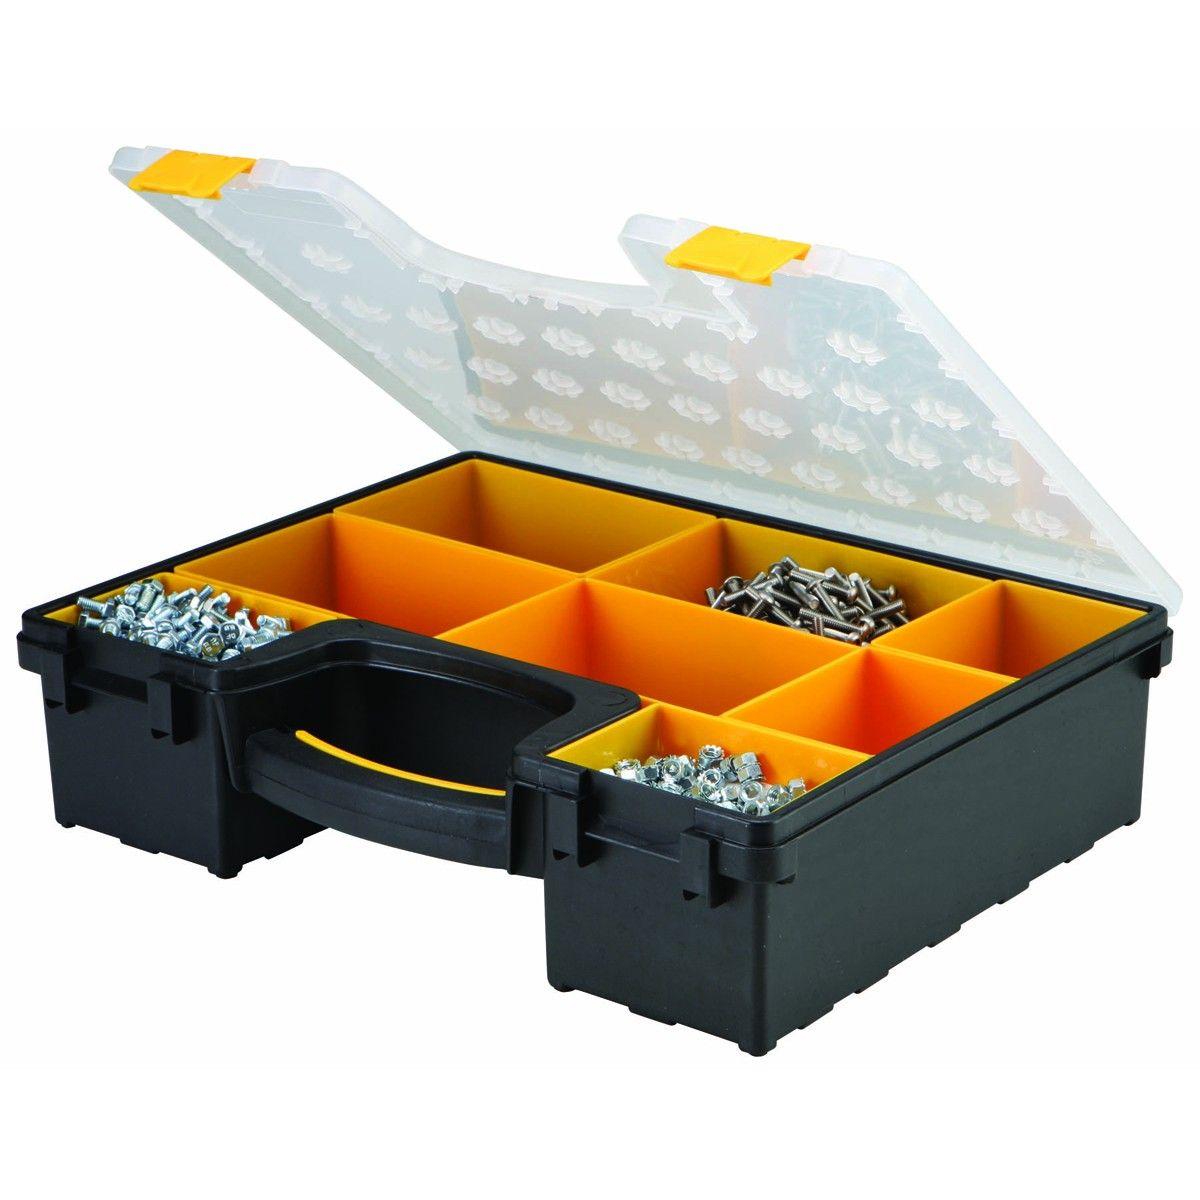 8 Bin Large Portable Parts Storage Case